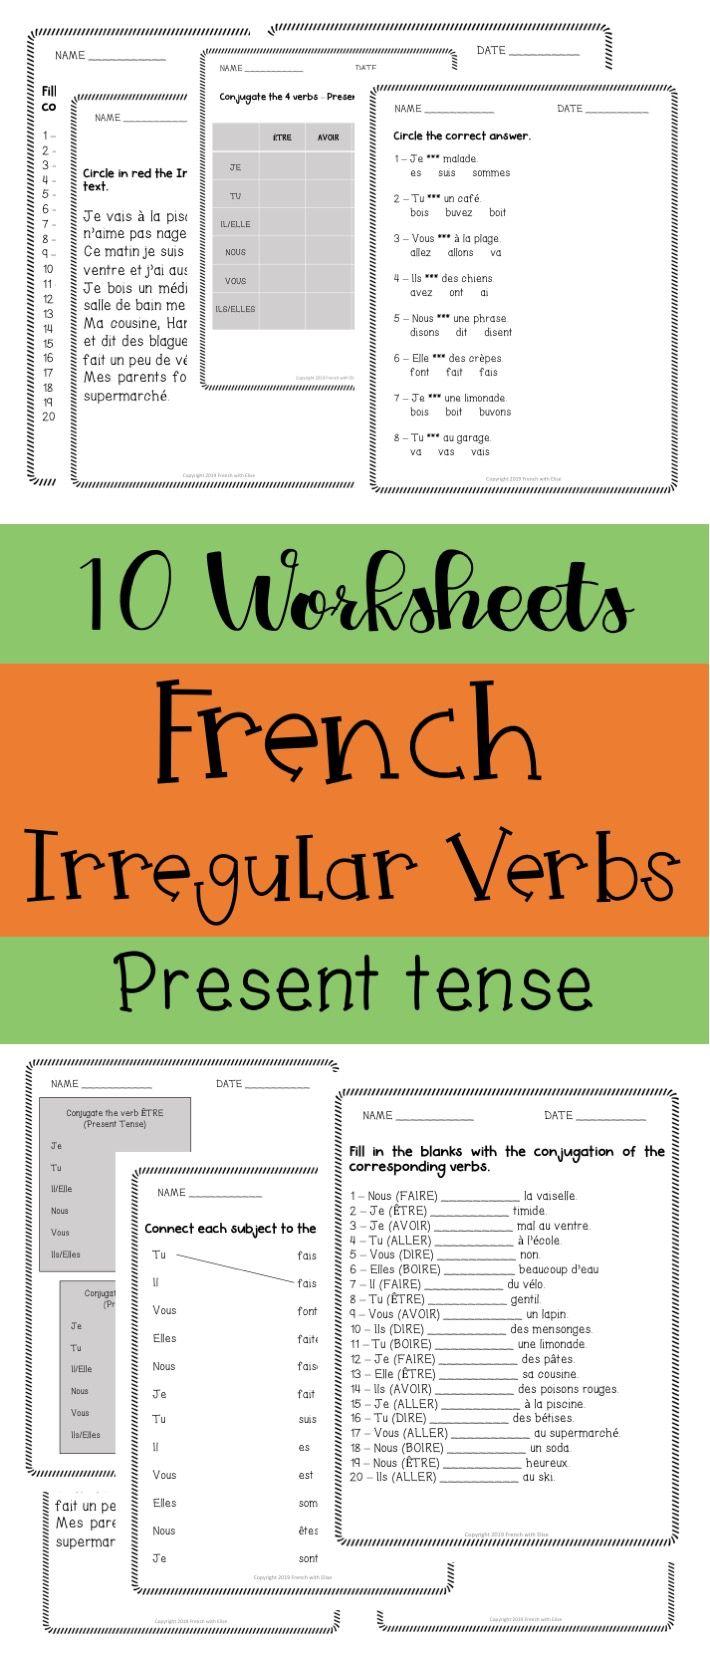 10 Worksheets French Irregular Verbs Present Tense Irregular Verbs Verb Worksheets Verb [ 1670 x 710 Pixel ]